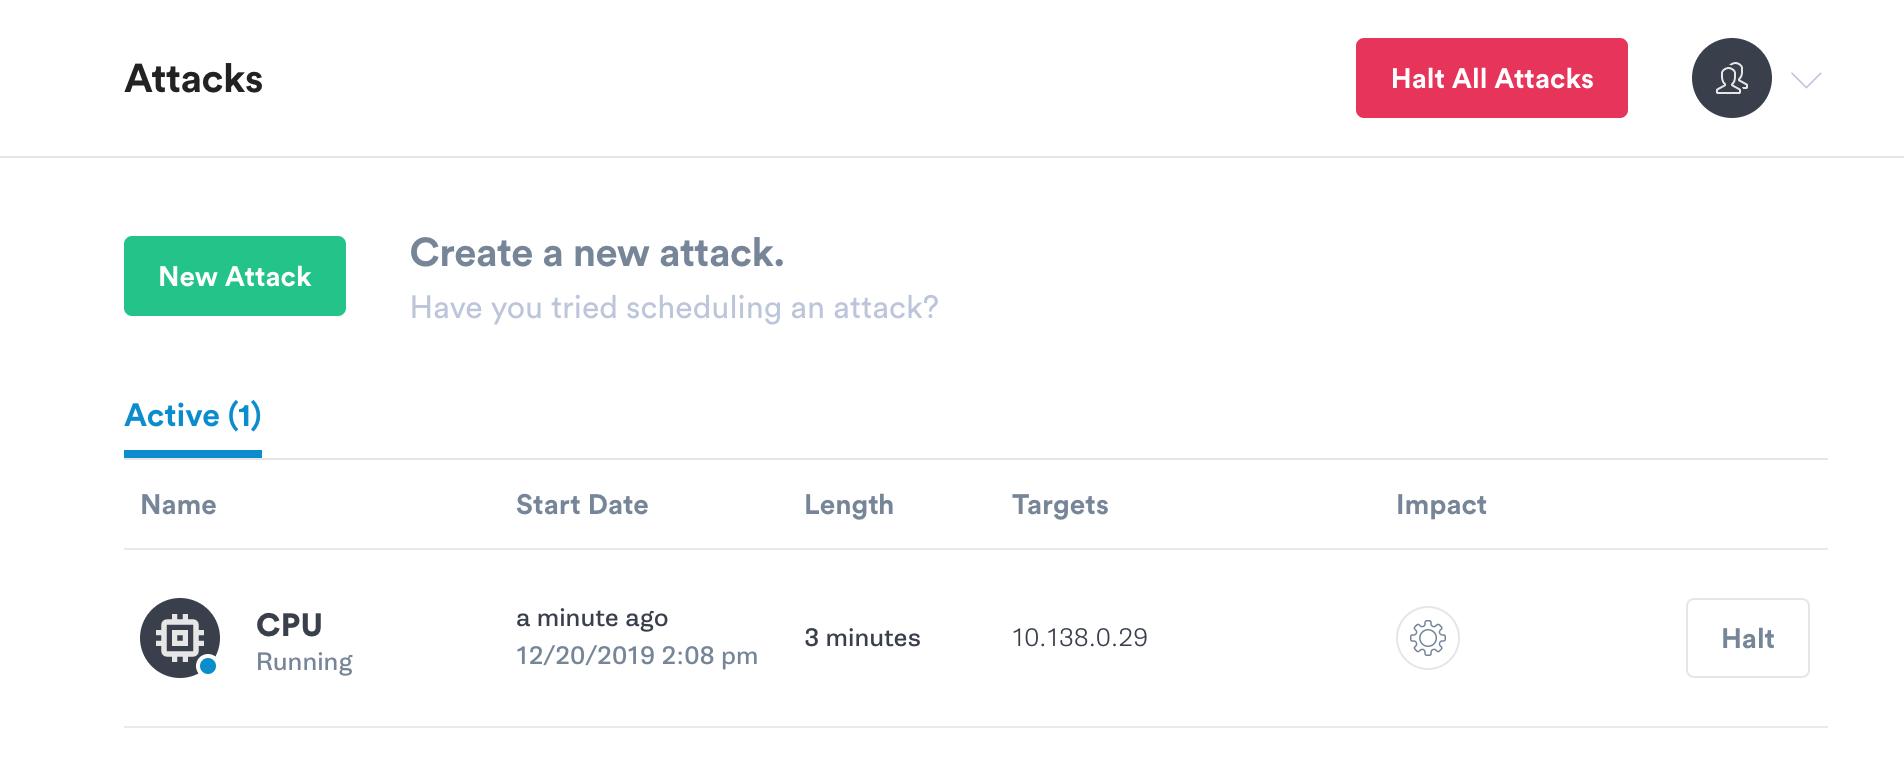 Halt attack buttons